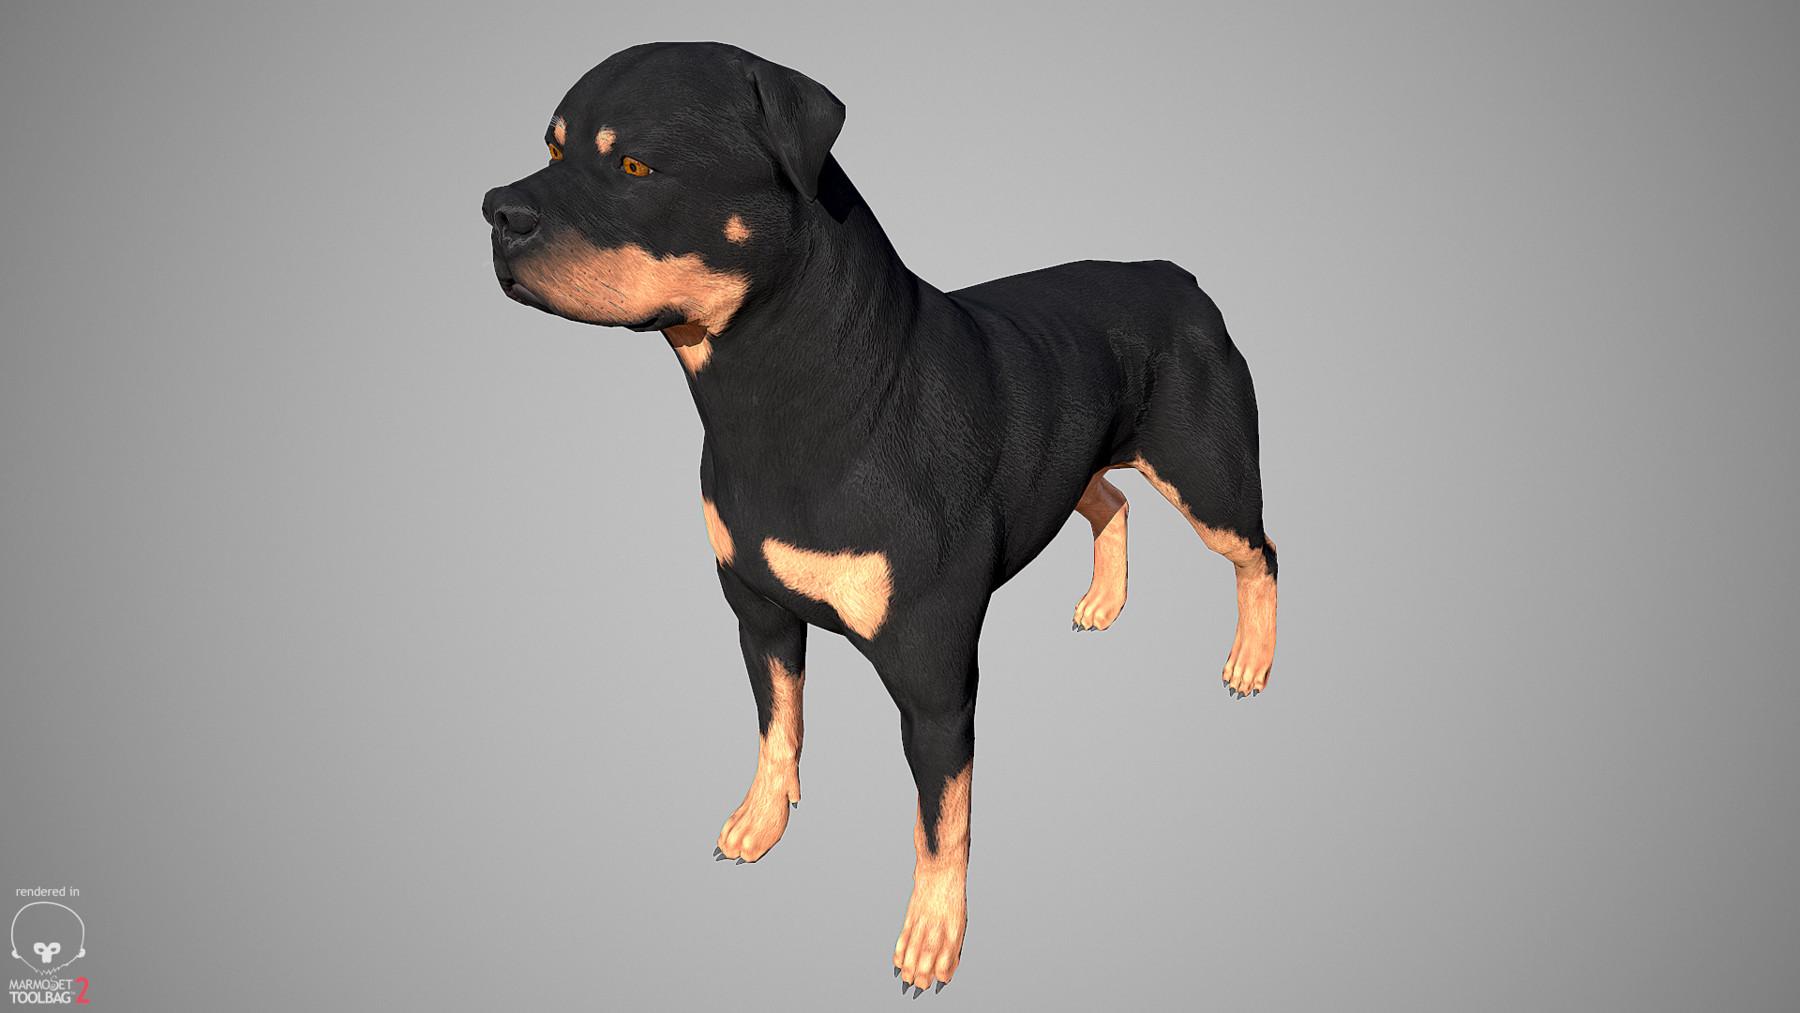 Rottweiler by alexlashko marmoset 06